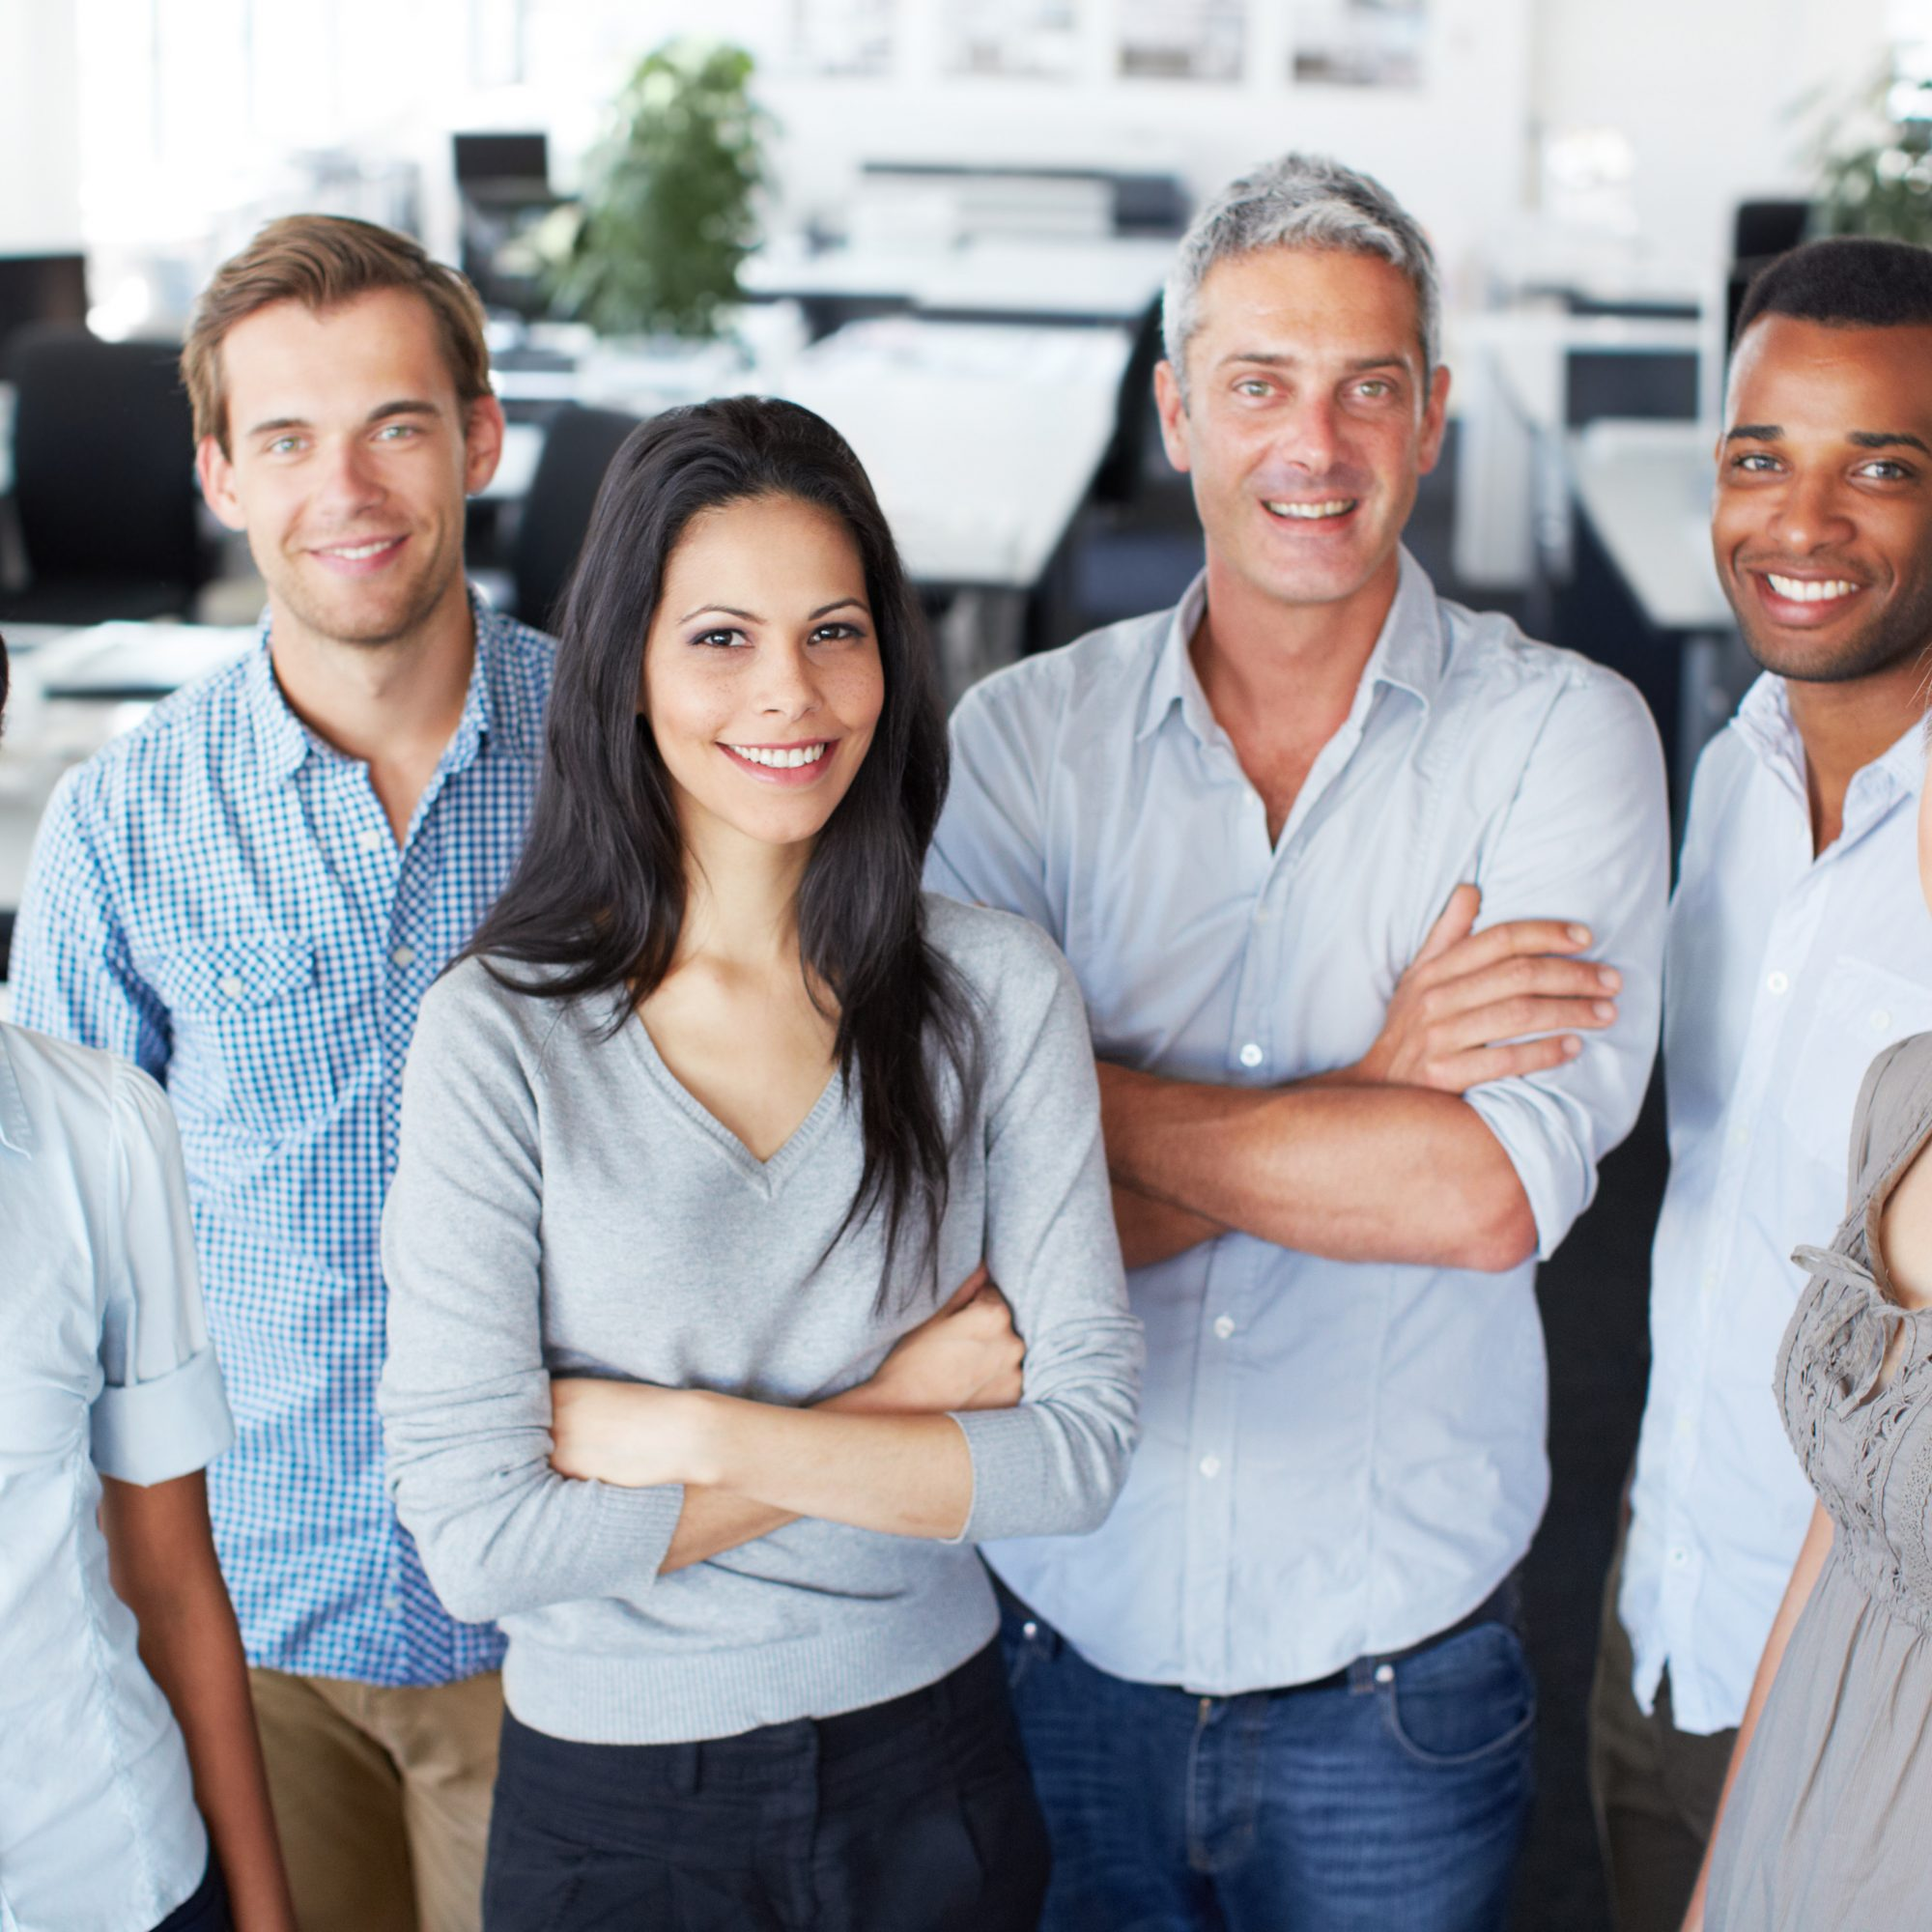 Portrait of a happy diverse office team